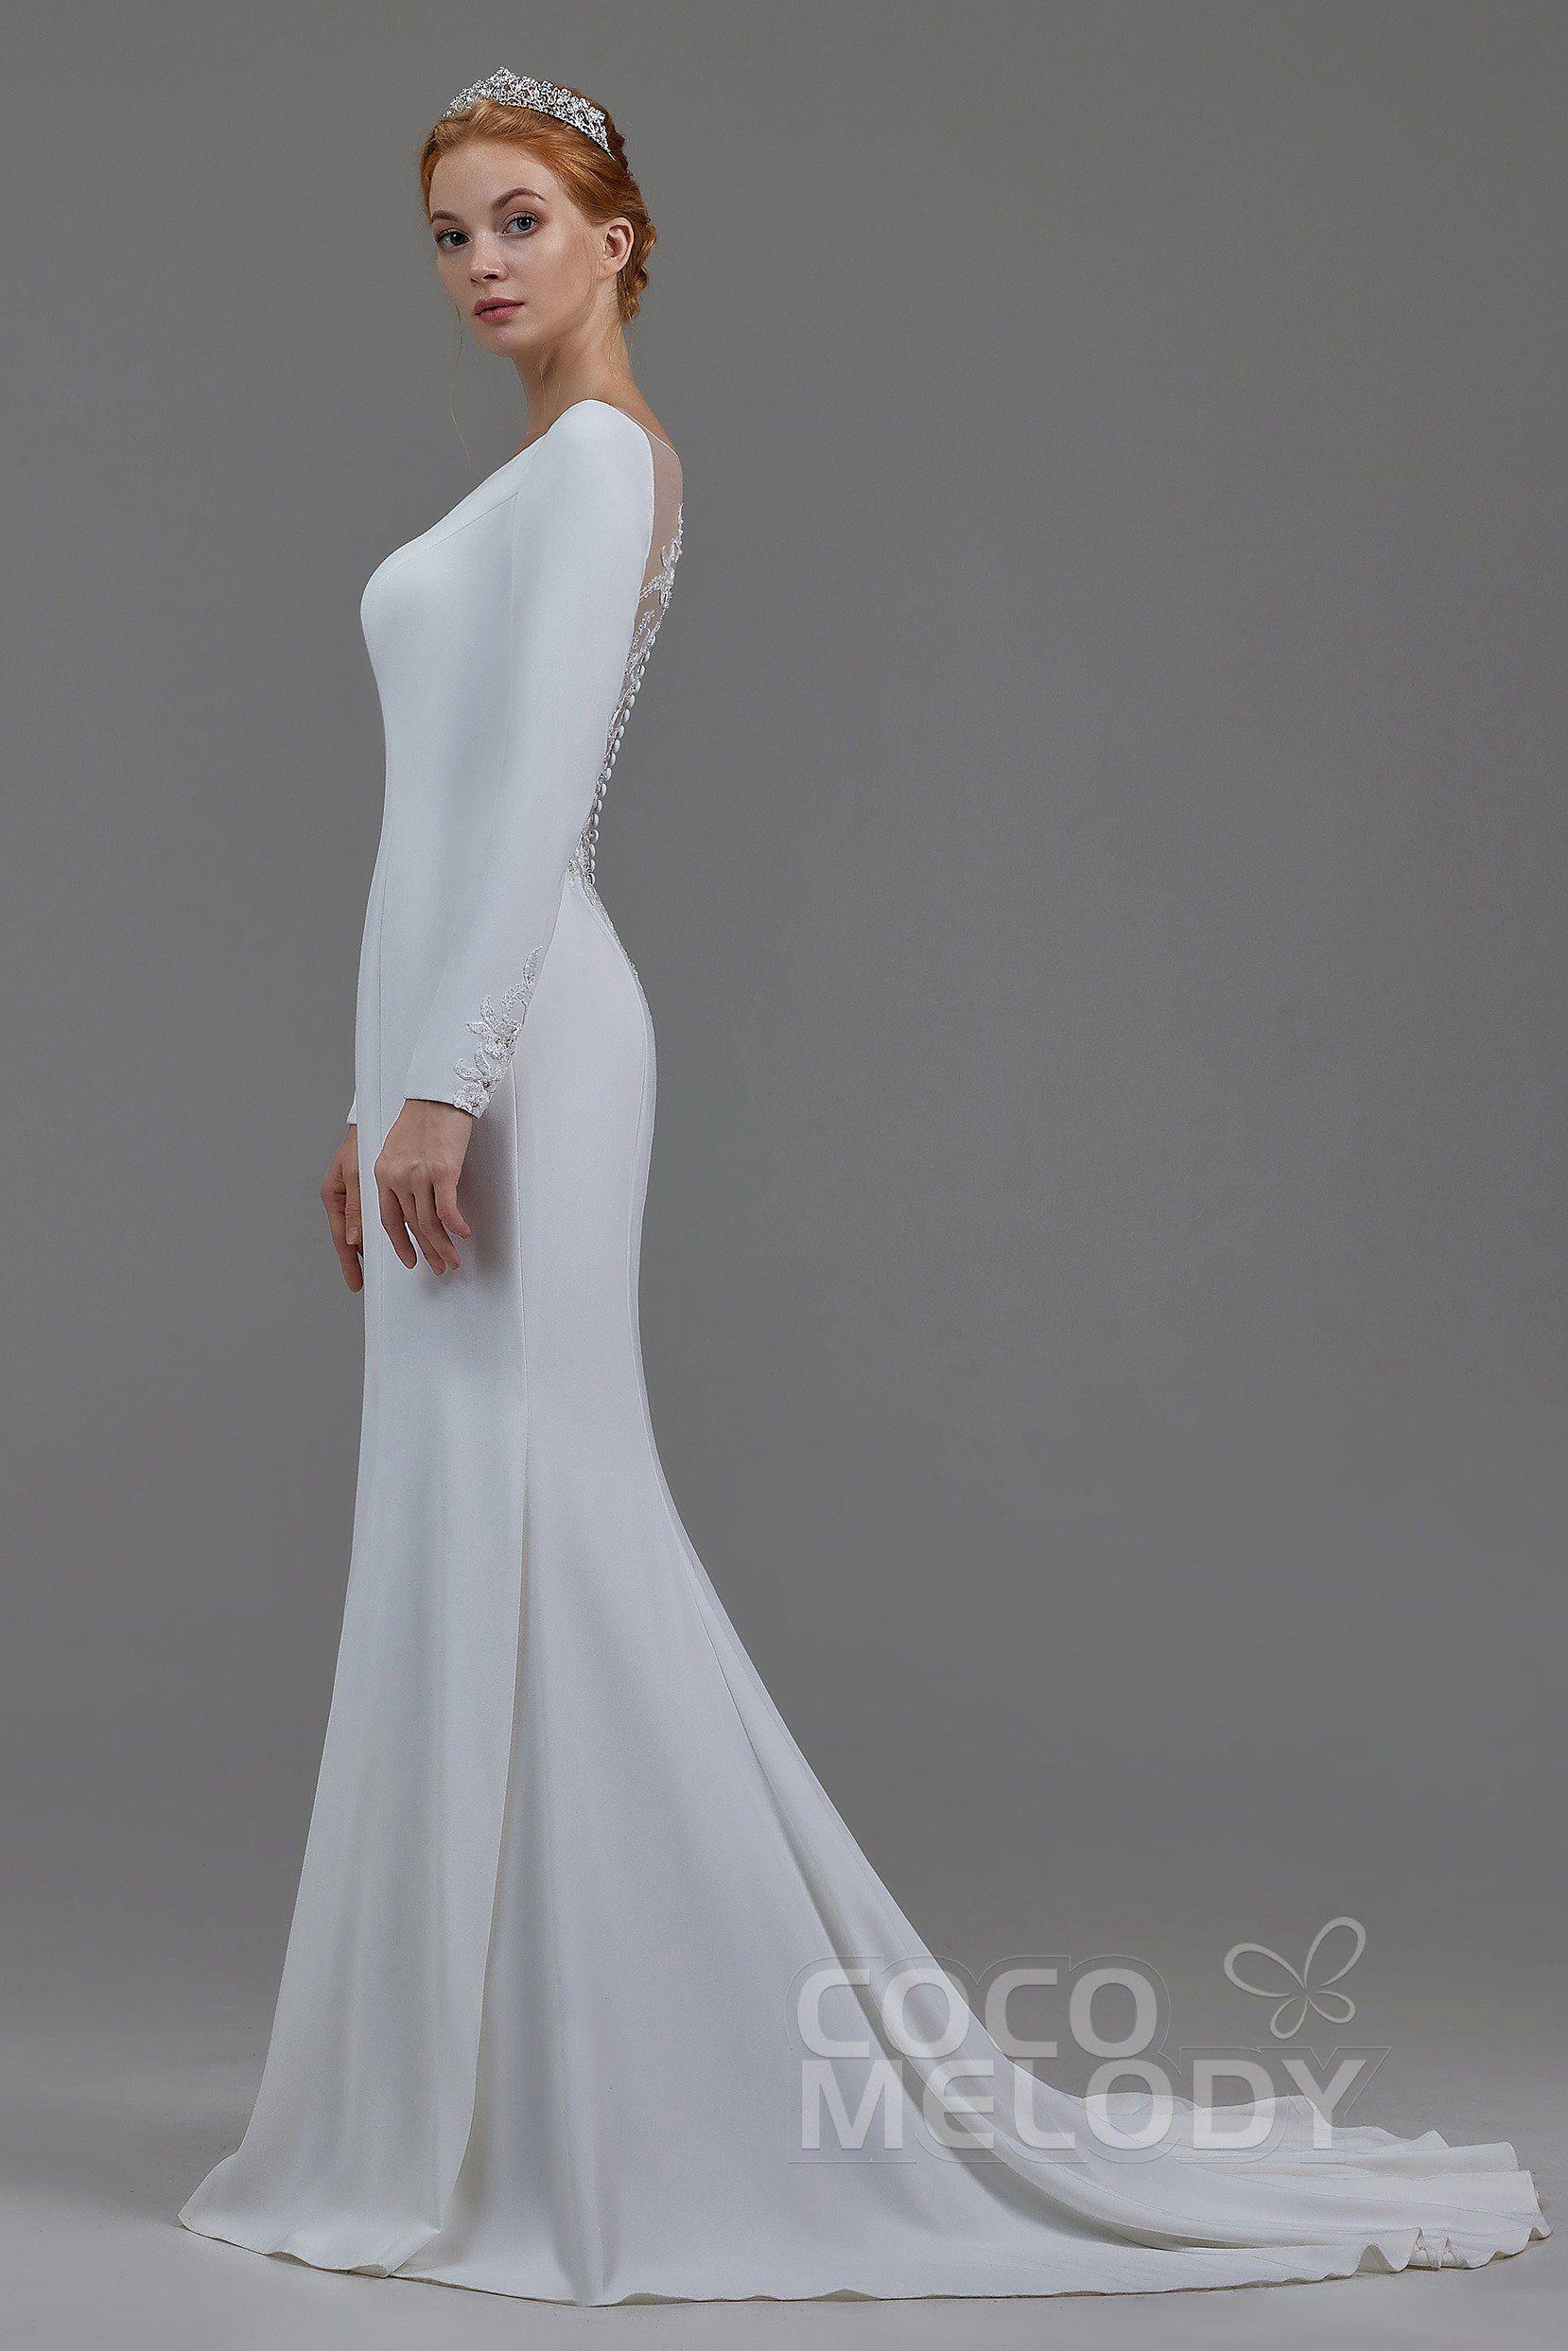 36d2ebff0 Trumpet-Mermaid Bateau Knitted Fabric Wedding Dress #LD5817 | Cocomelody  #cocomelody #weddingdress #mermaidweddingdress #2019newcollection